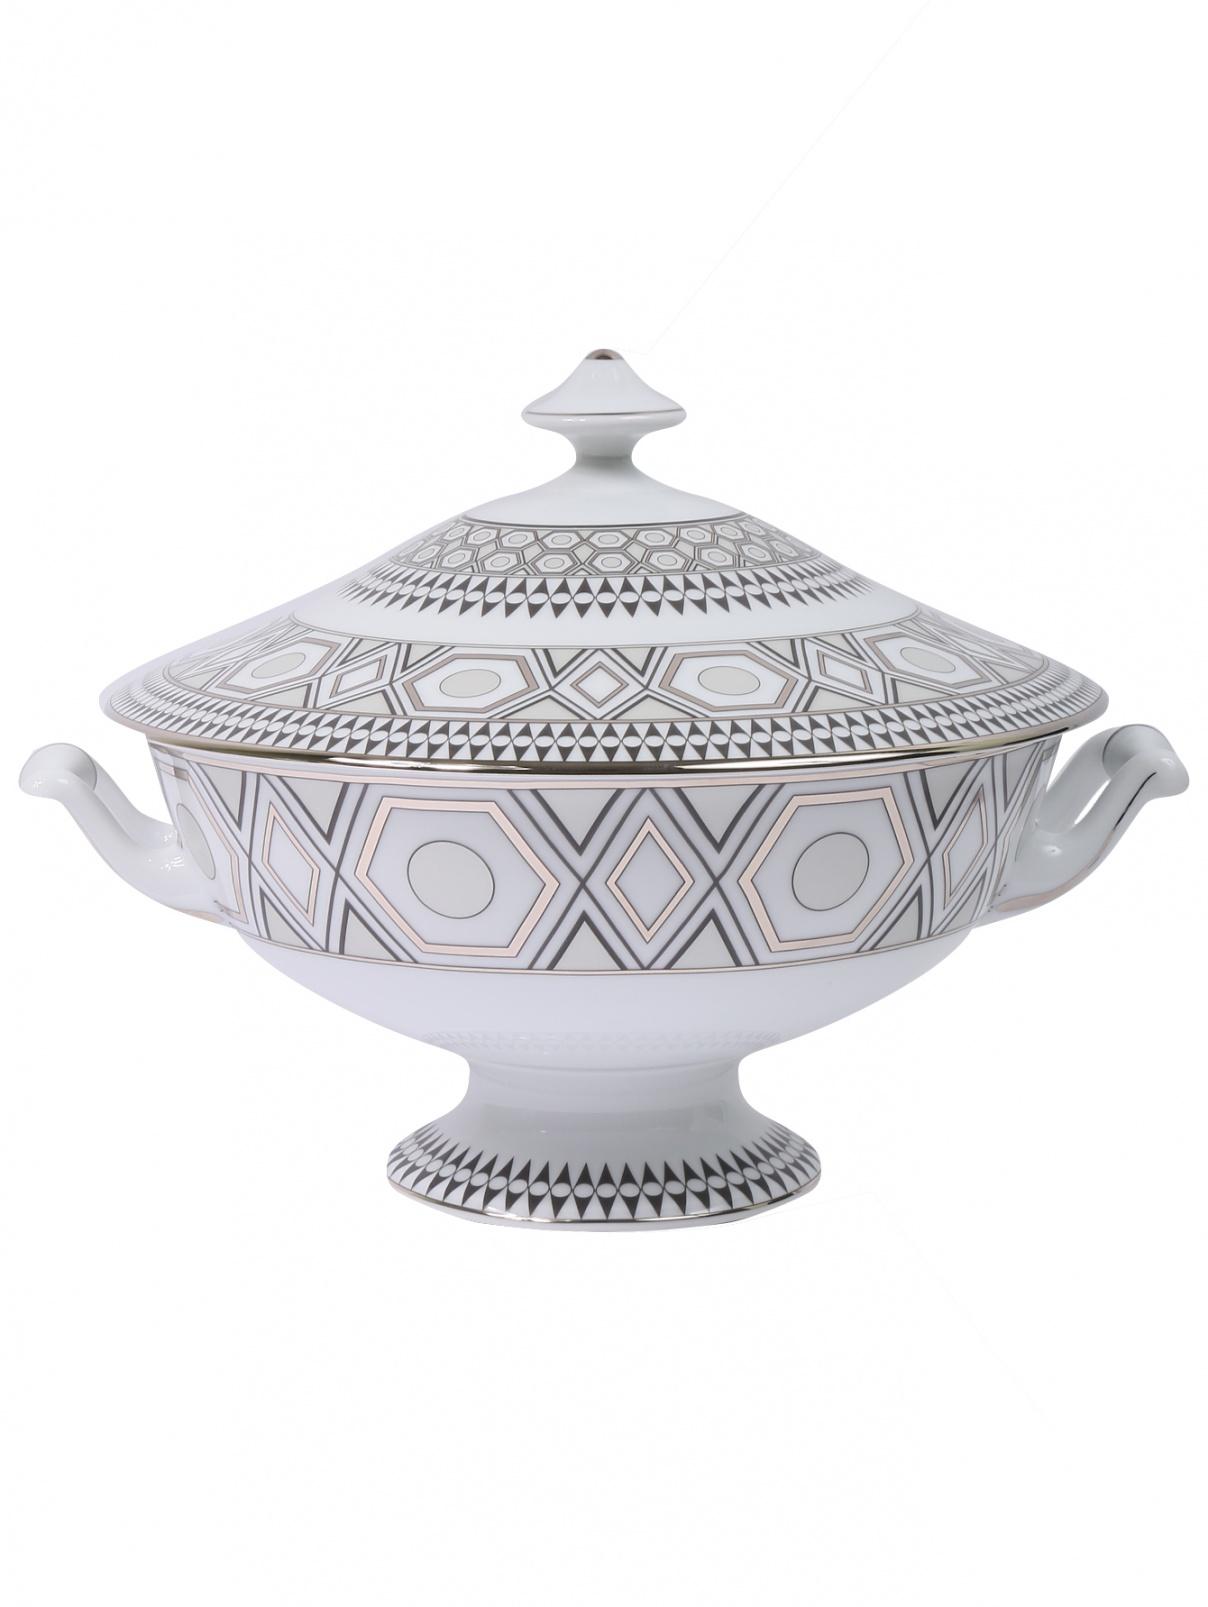 Супница из фарфора с геометрическим узором Haviland  –  Общий вид